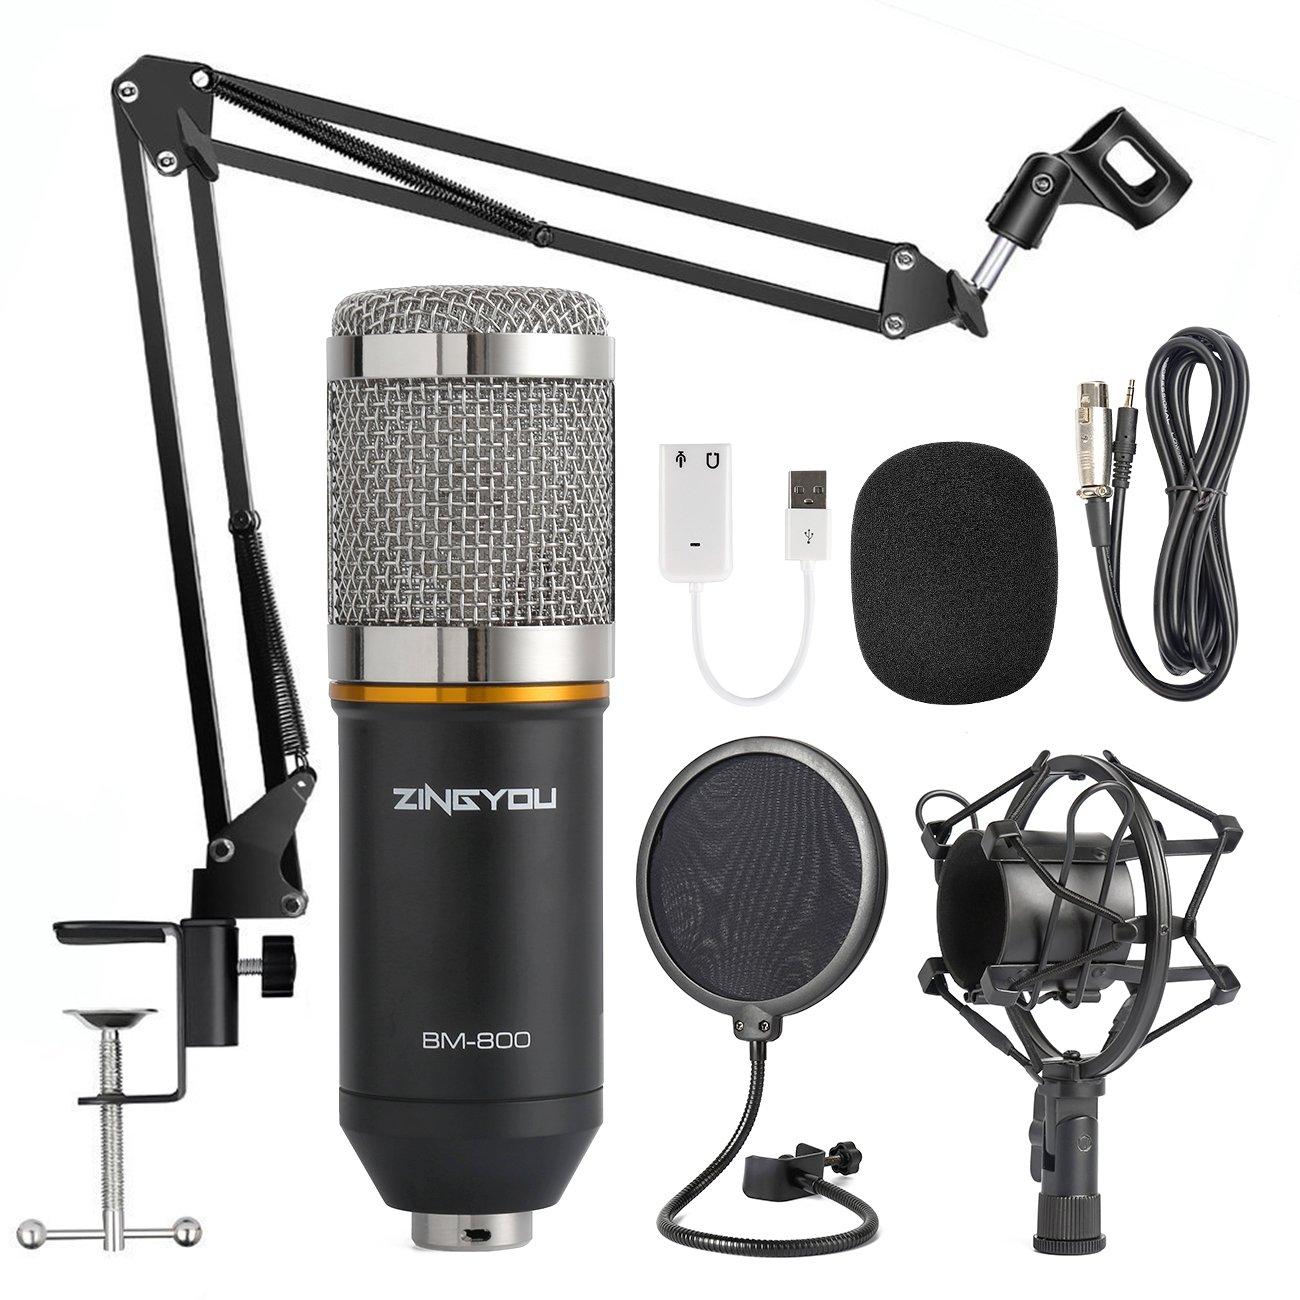 ZINGYOU Condenser Microphone Bundle, BM-800 Mic Kit with Adjustable Mic Suspension Scissor Arm, Shock Mount and Double-layer Pop Filter for Studio Recording & Brocasting (BM-800 Microphone Bundle) by ZINGYOU